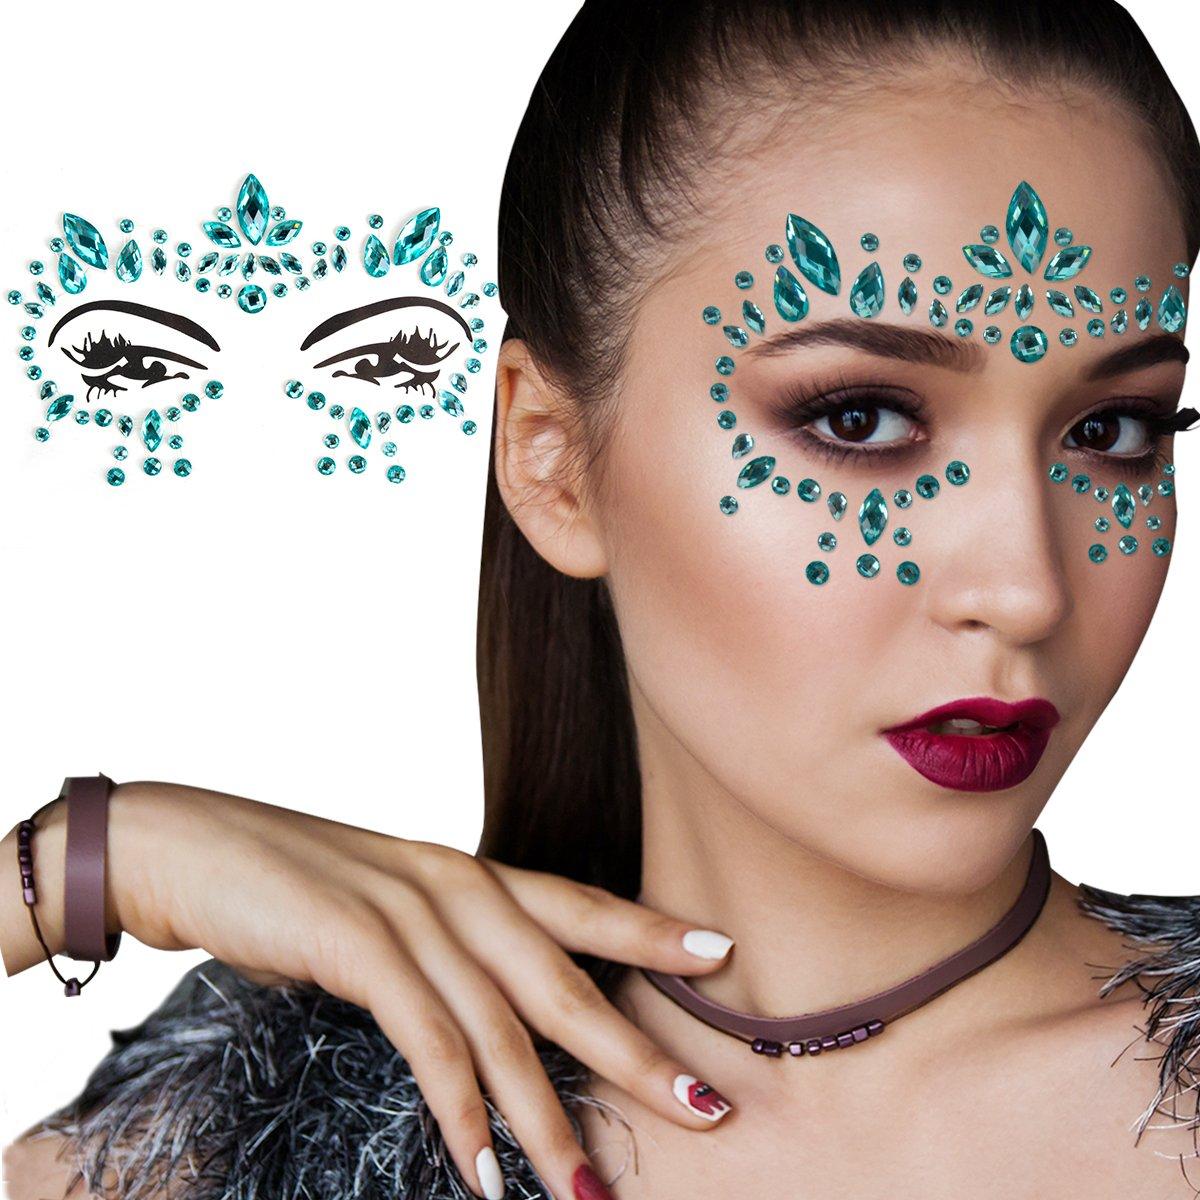 Zoylink Face Jewelry Crystal Sticker Fashionable Removable Rhinestone Sticker Eye Gem